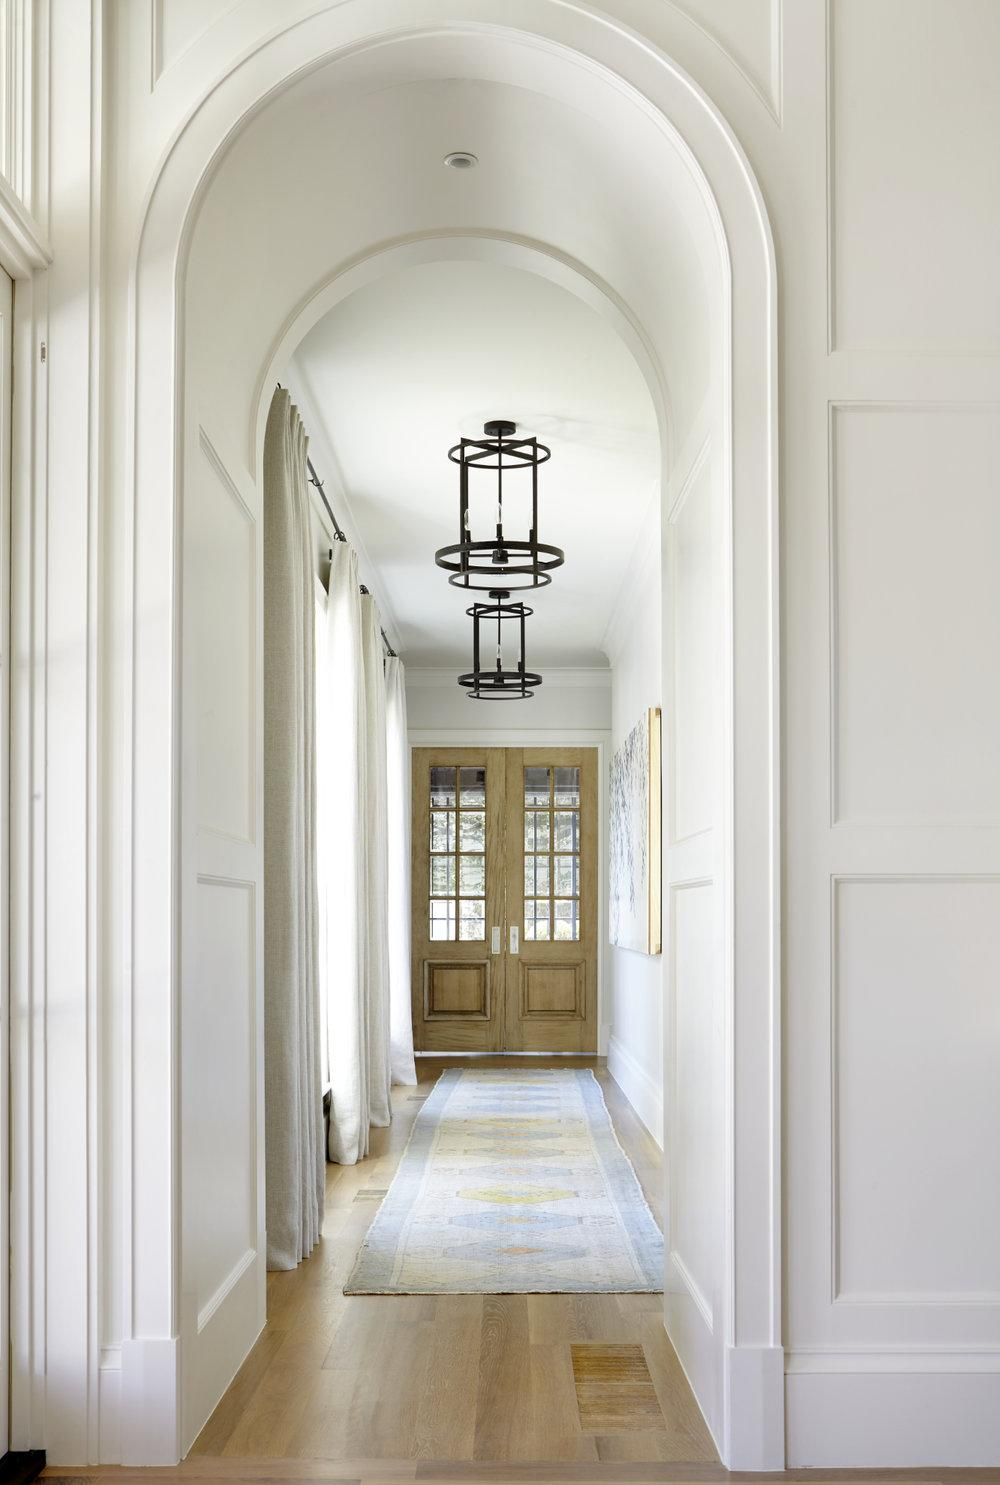 Дизайн интерьера коридора с аркой